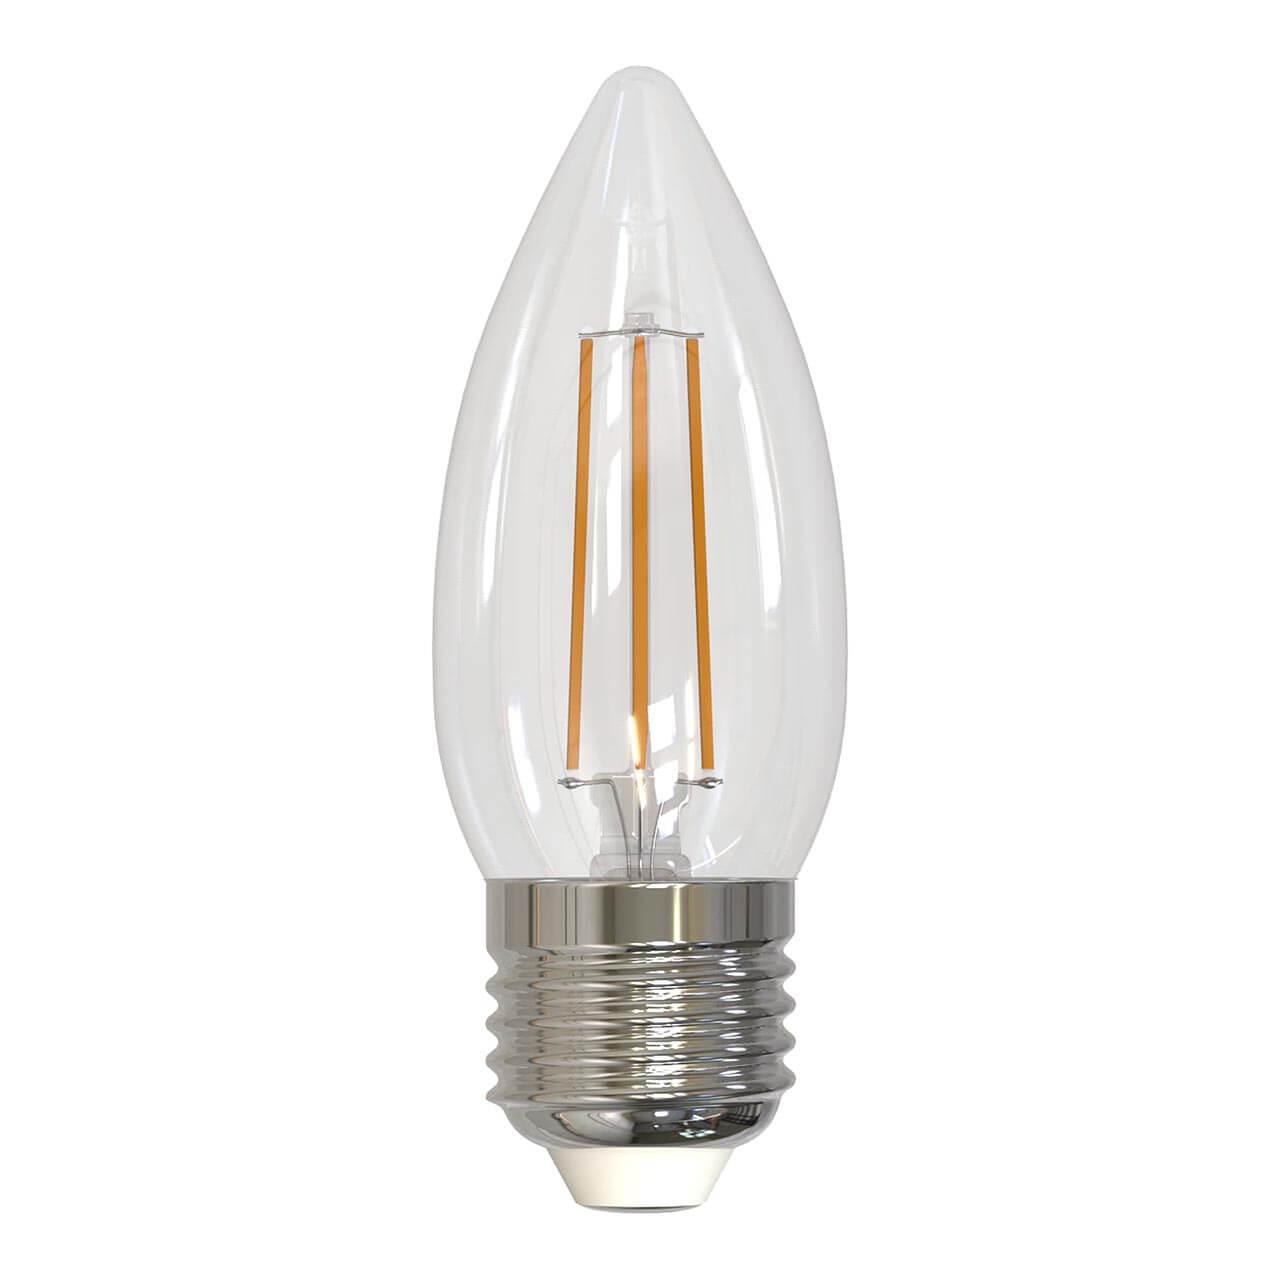 Лампочка Uniel LED-C35-5W/WW/E27/CL/DIM AIR DIM (Диммирование) чулки dim dim up nude sensation